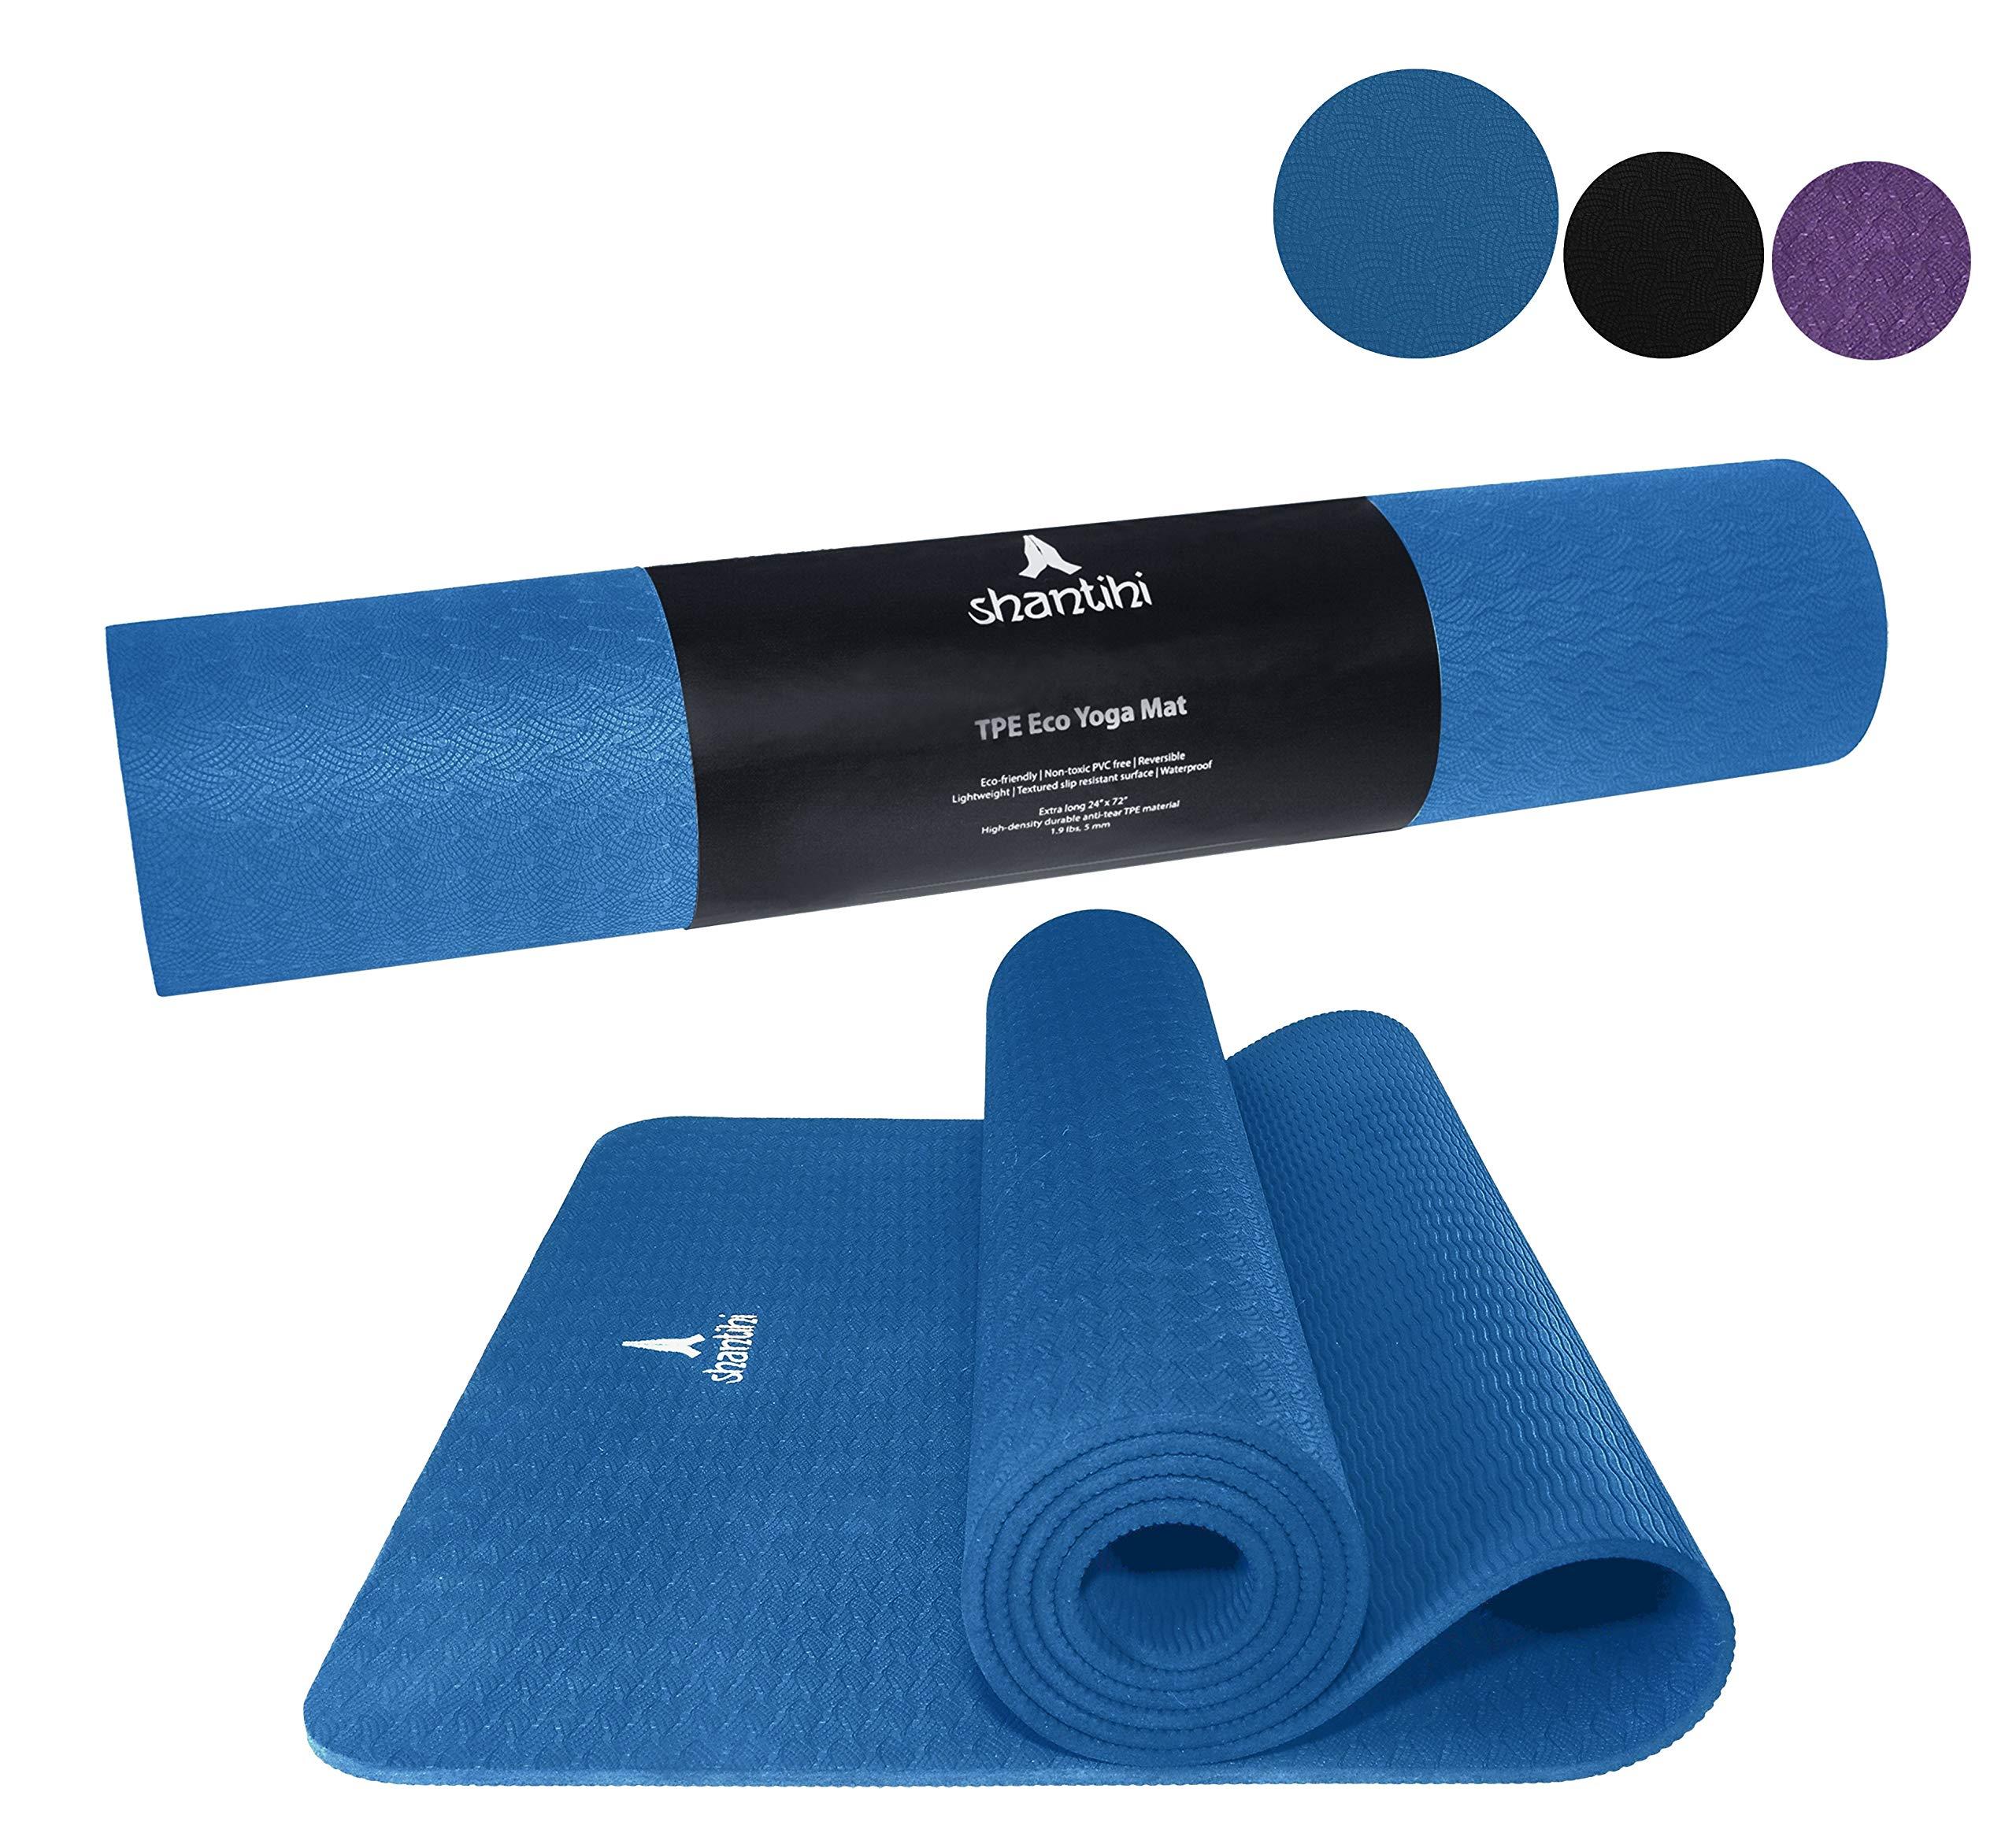 "Shantihi Yoga Mat - Thick Eco Friendly Premium TPE Yoga Mat. Non Slip, Reversible, Lightweight, Durable Exercise Pilates Mat. Free Bonus eBook. 72""x24"", 5mm."